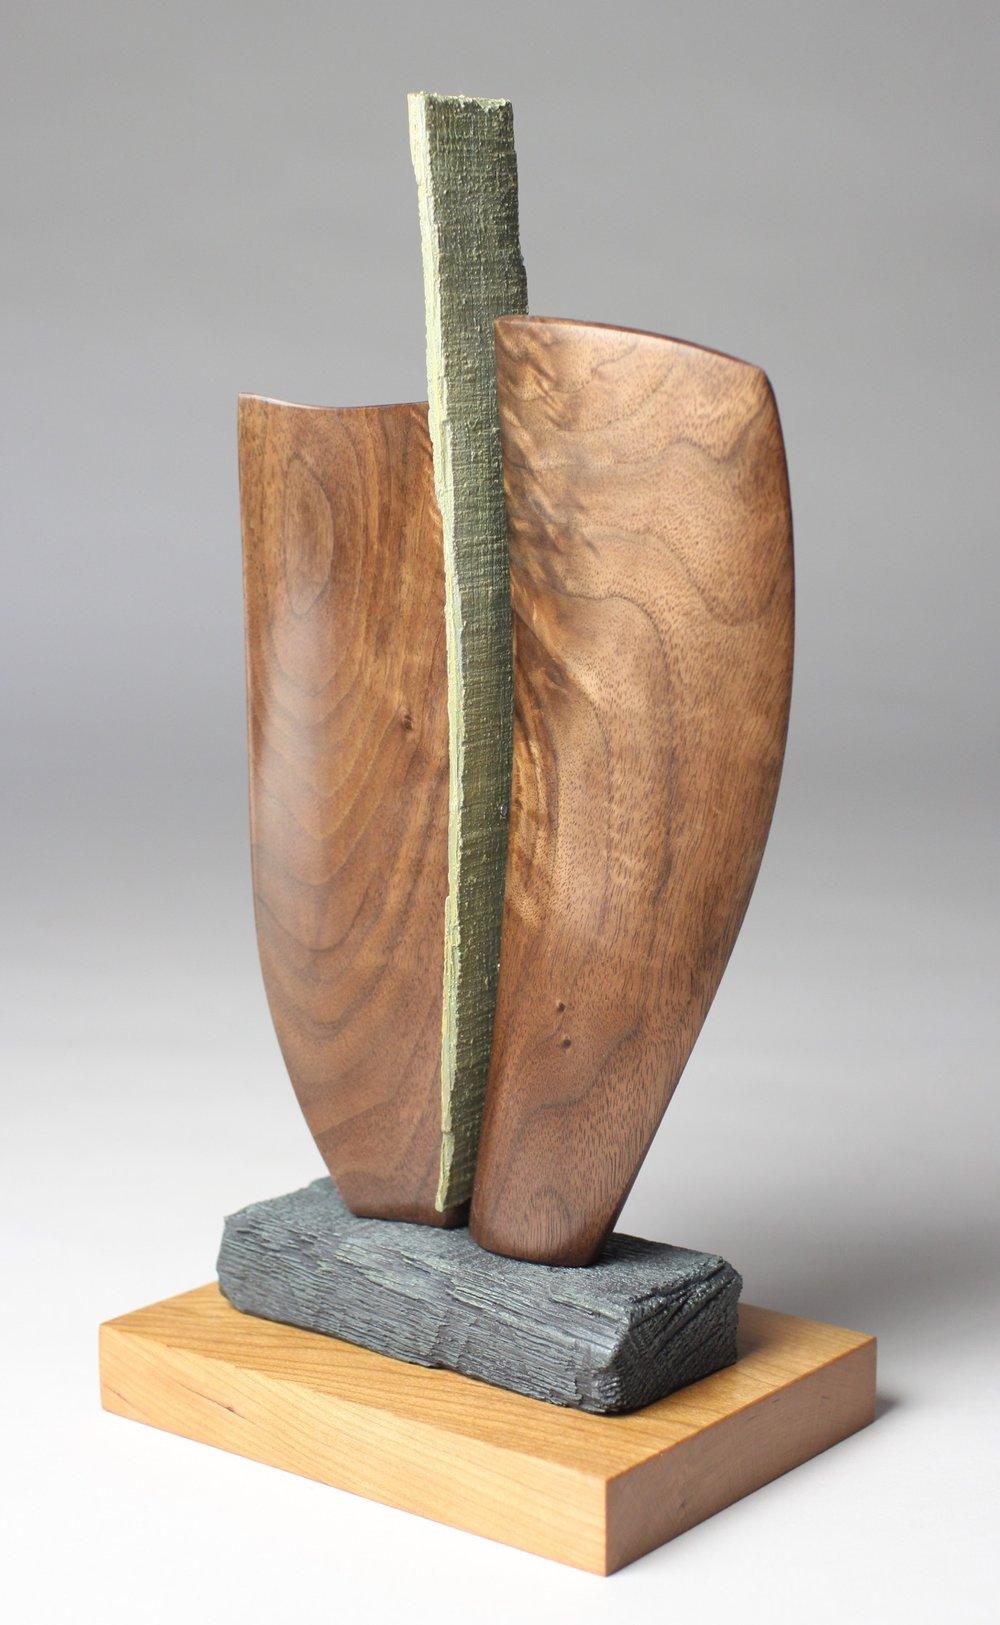 Sculpture #2 (view 2)